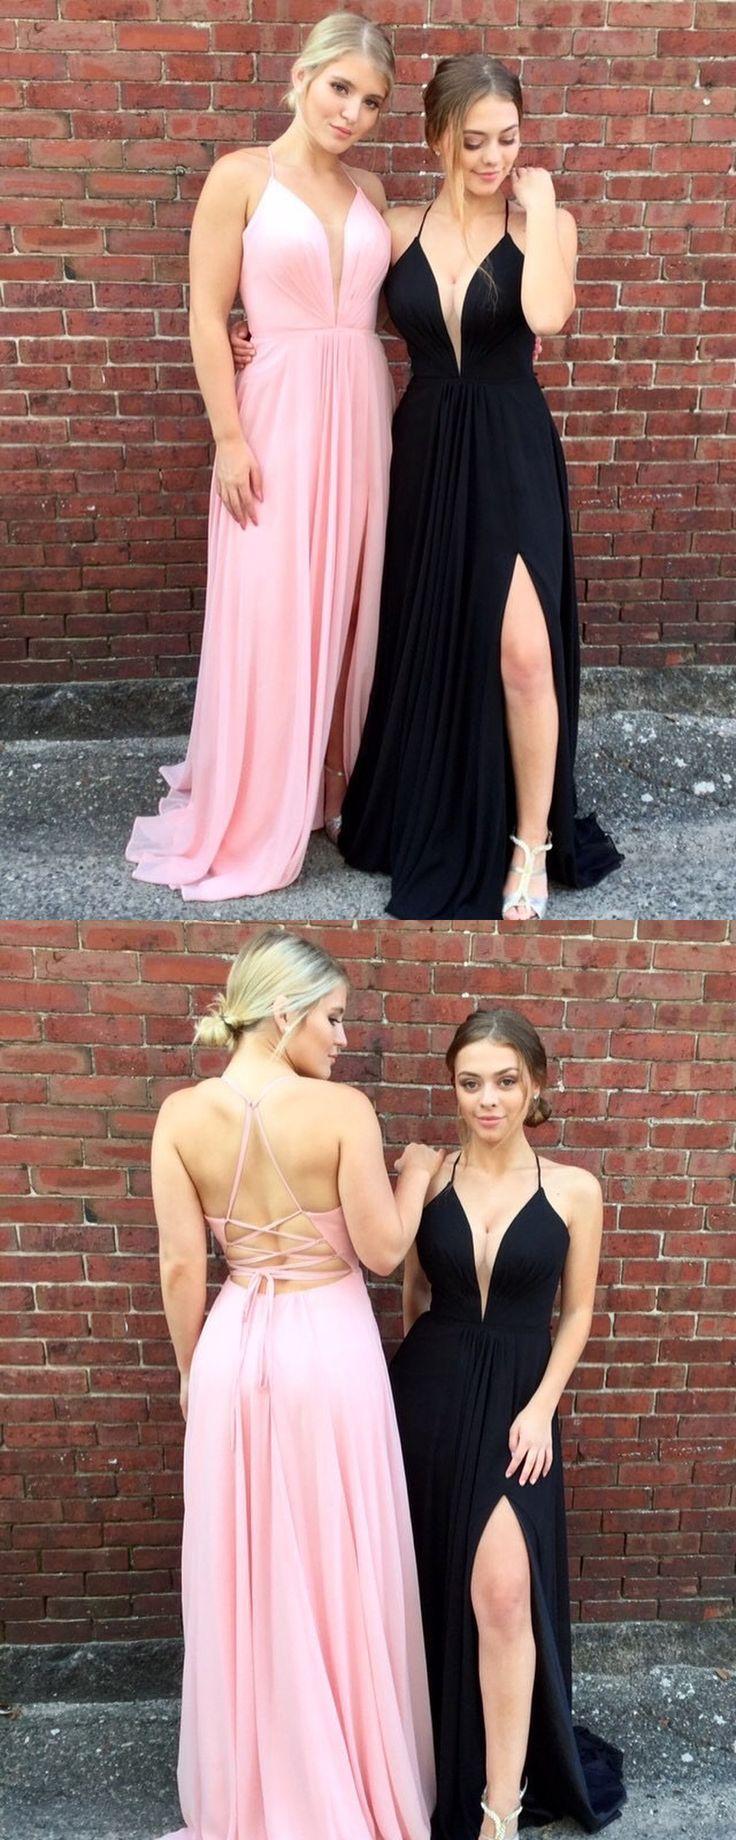 prom dresses, 2018 prom dresses, long prom dresses, pink prom dresses with slit, black long slit prom dresses, evening dresses